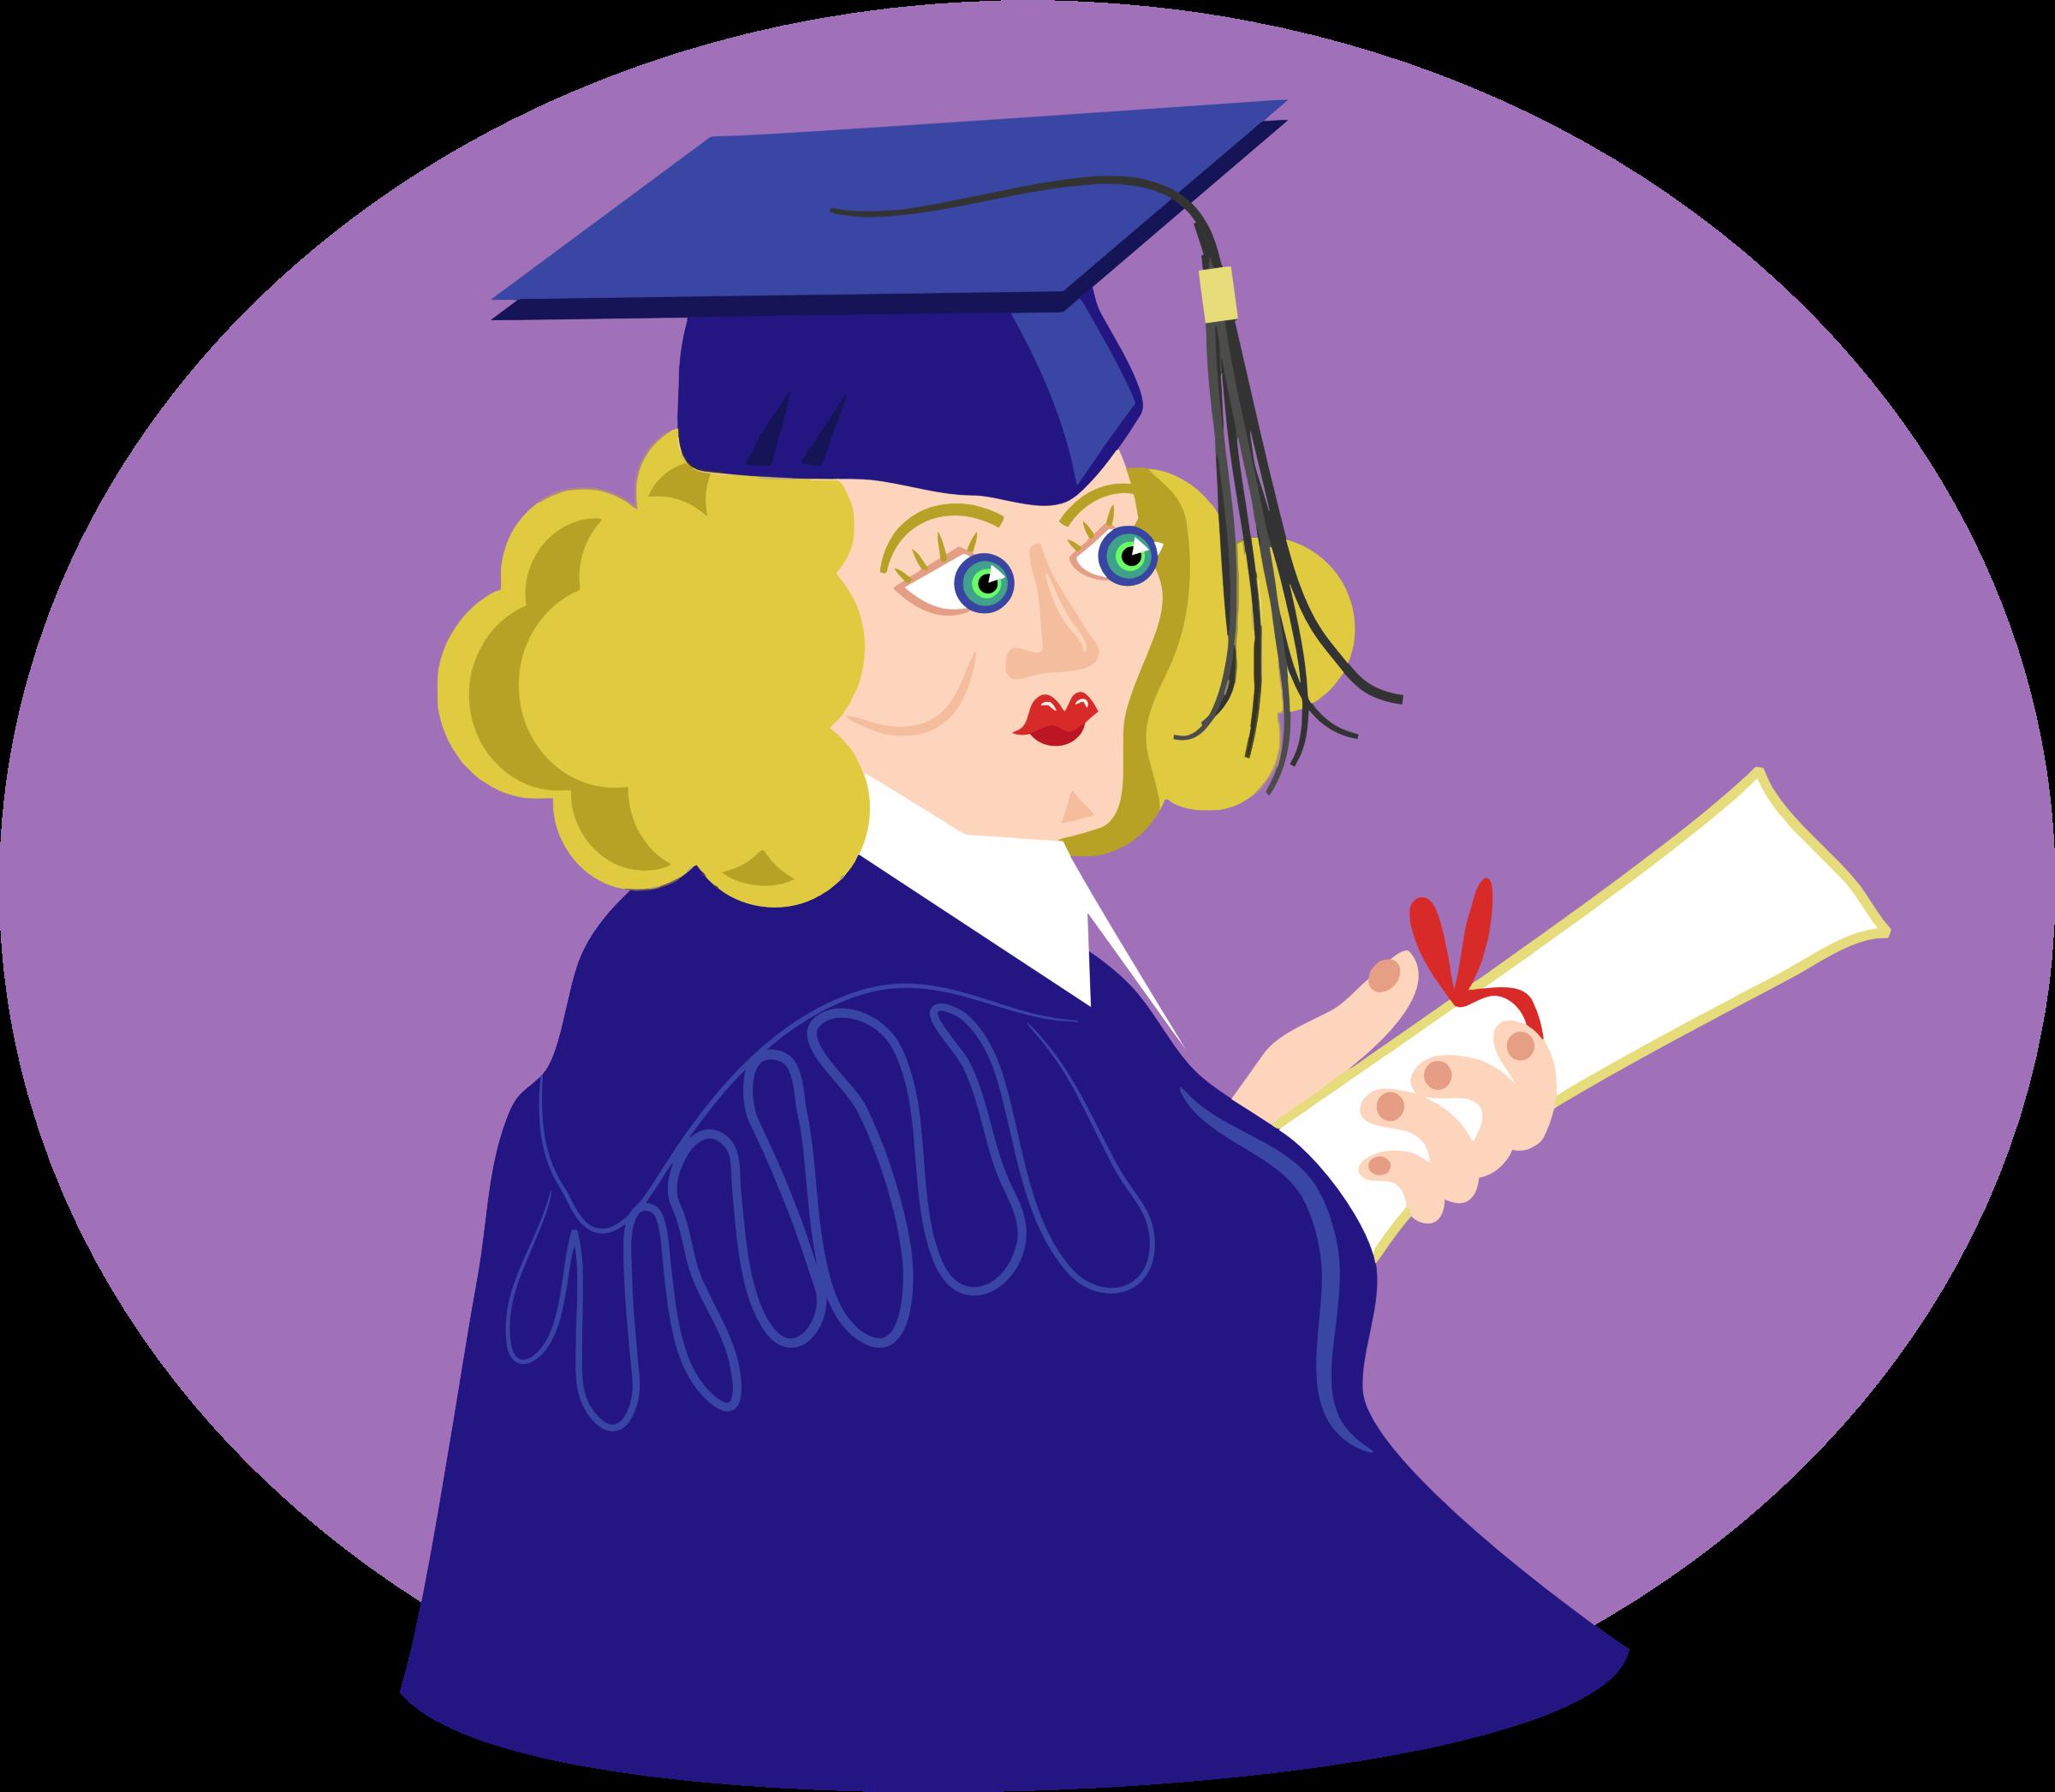 Girl big image png. Purple clipart graduation